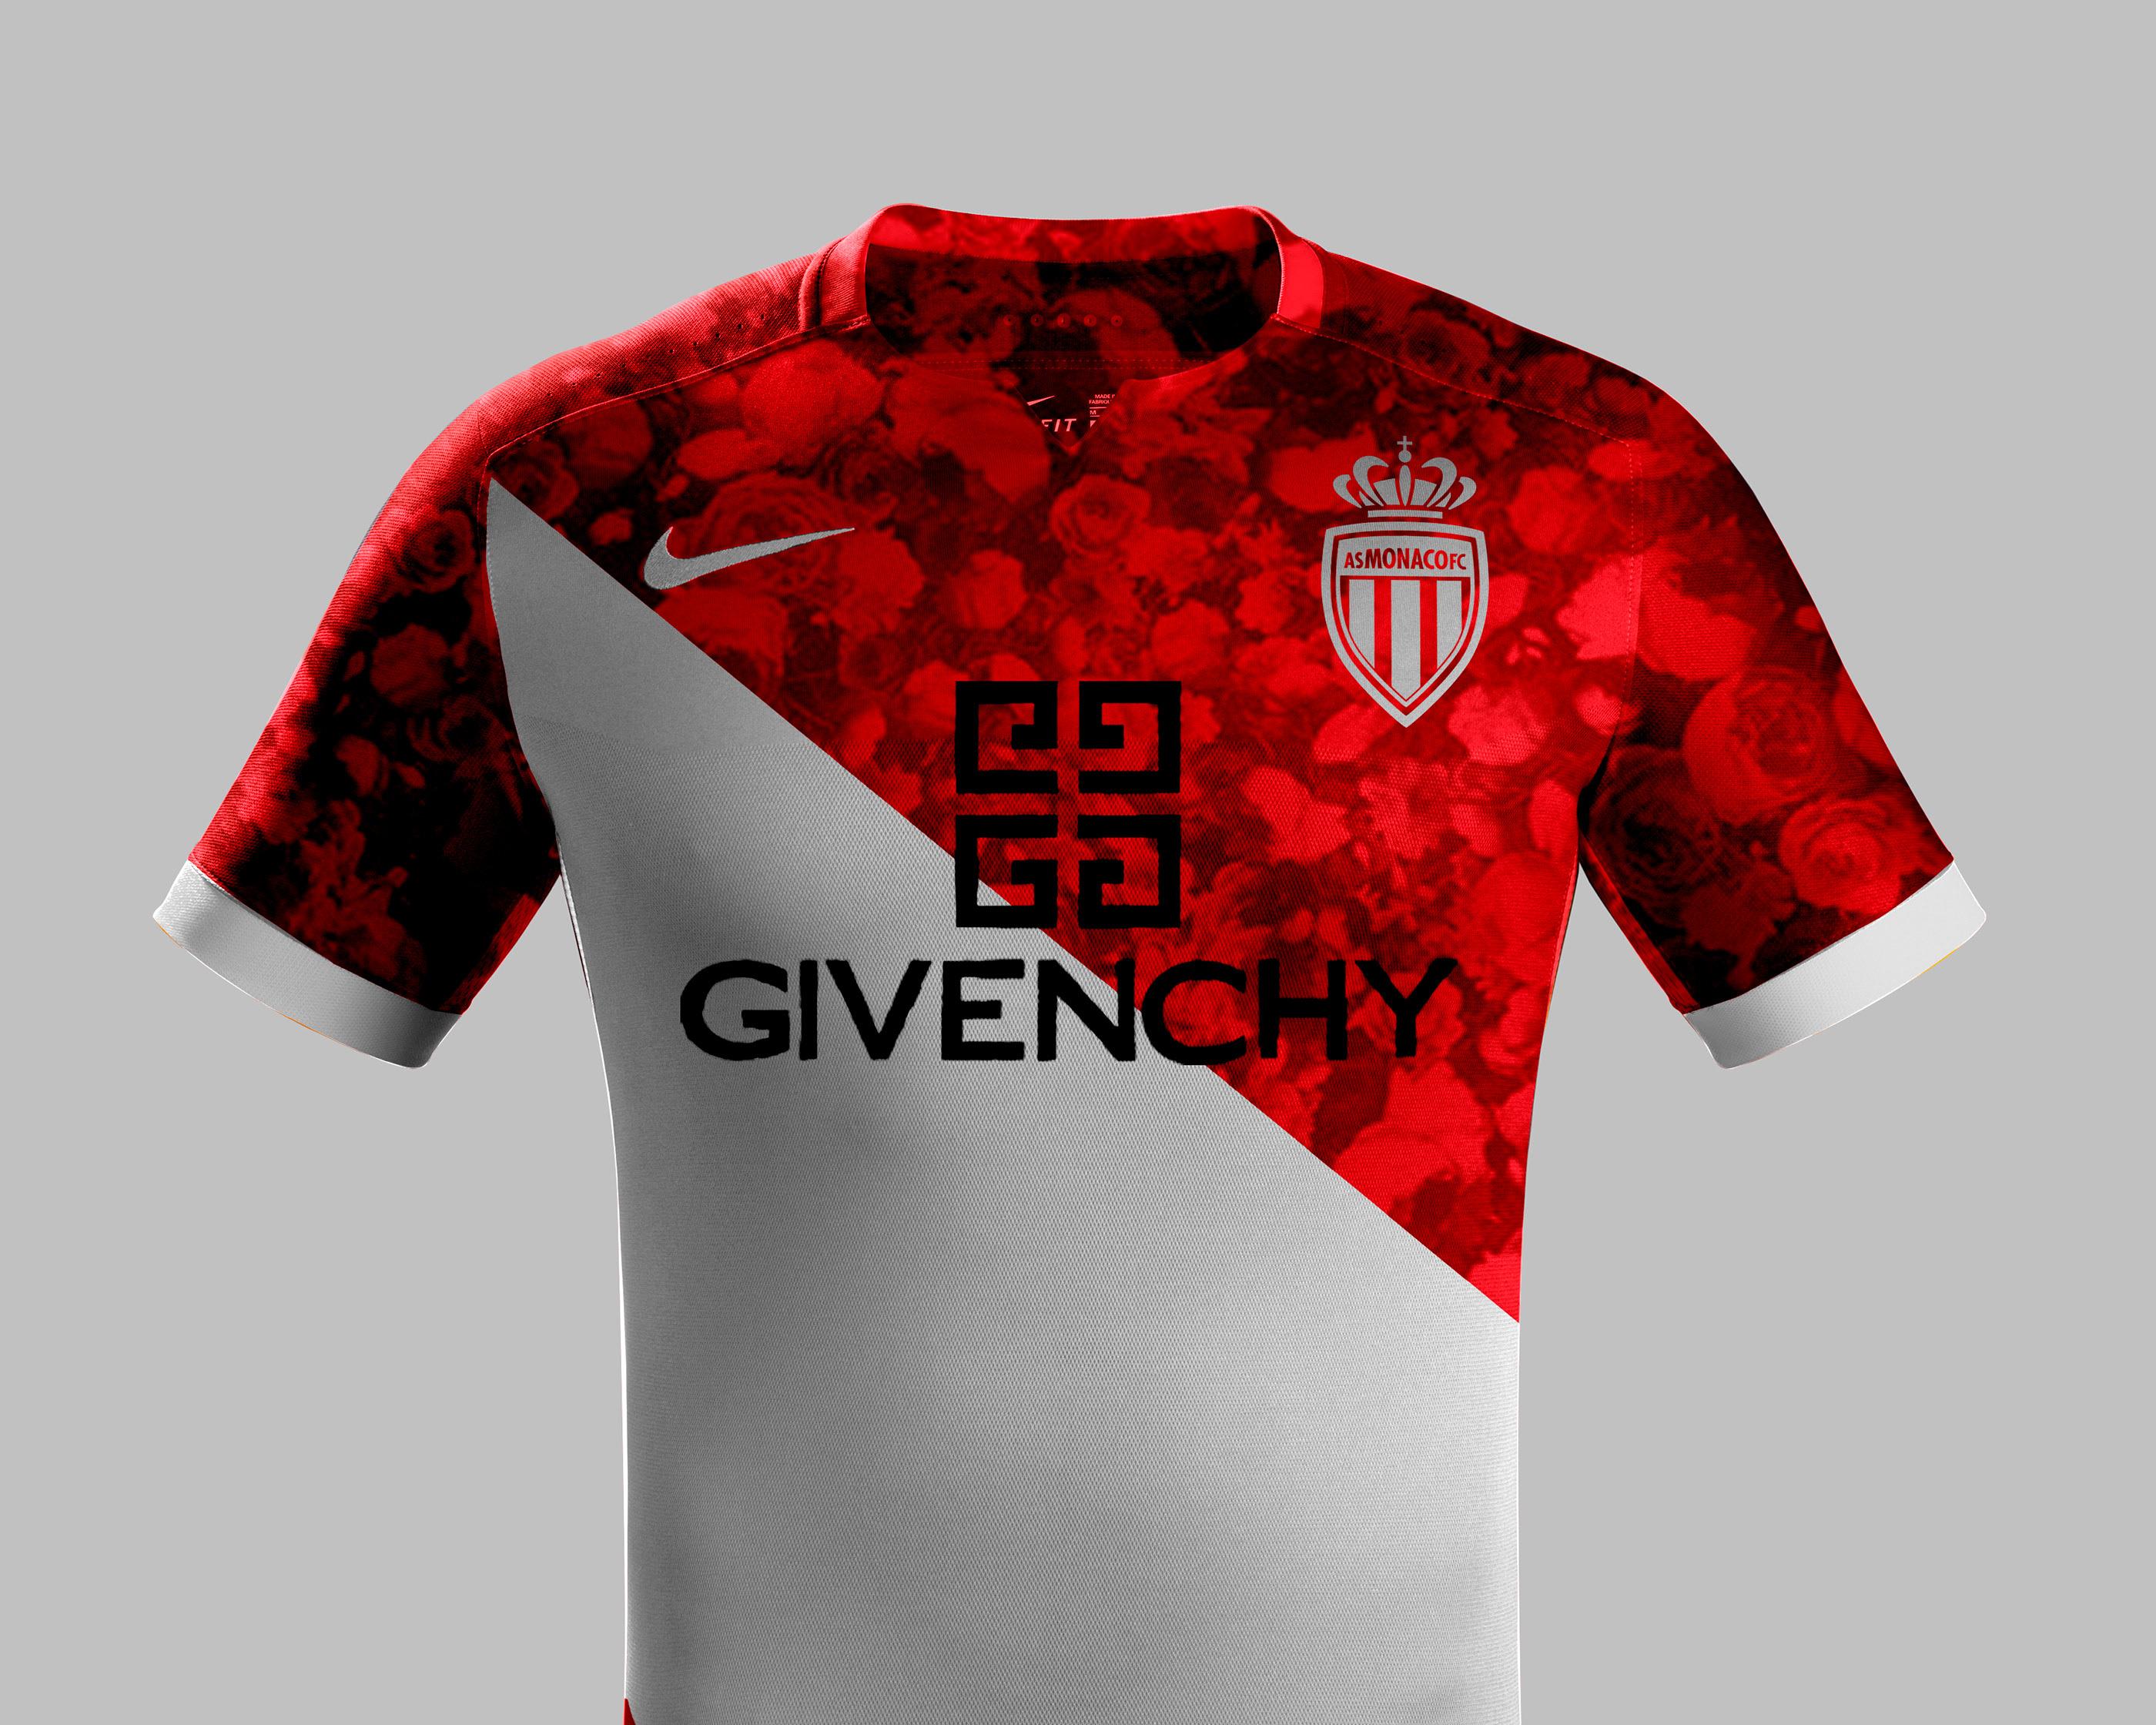 5911e724da3 Luxury Brand Football Kits on Behance